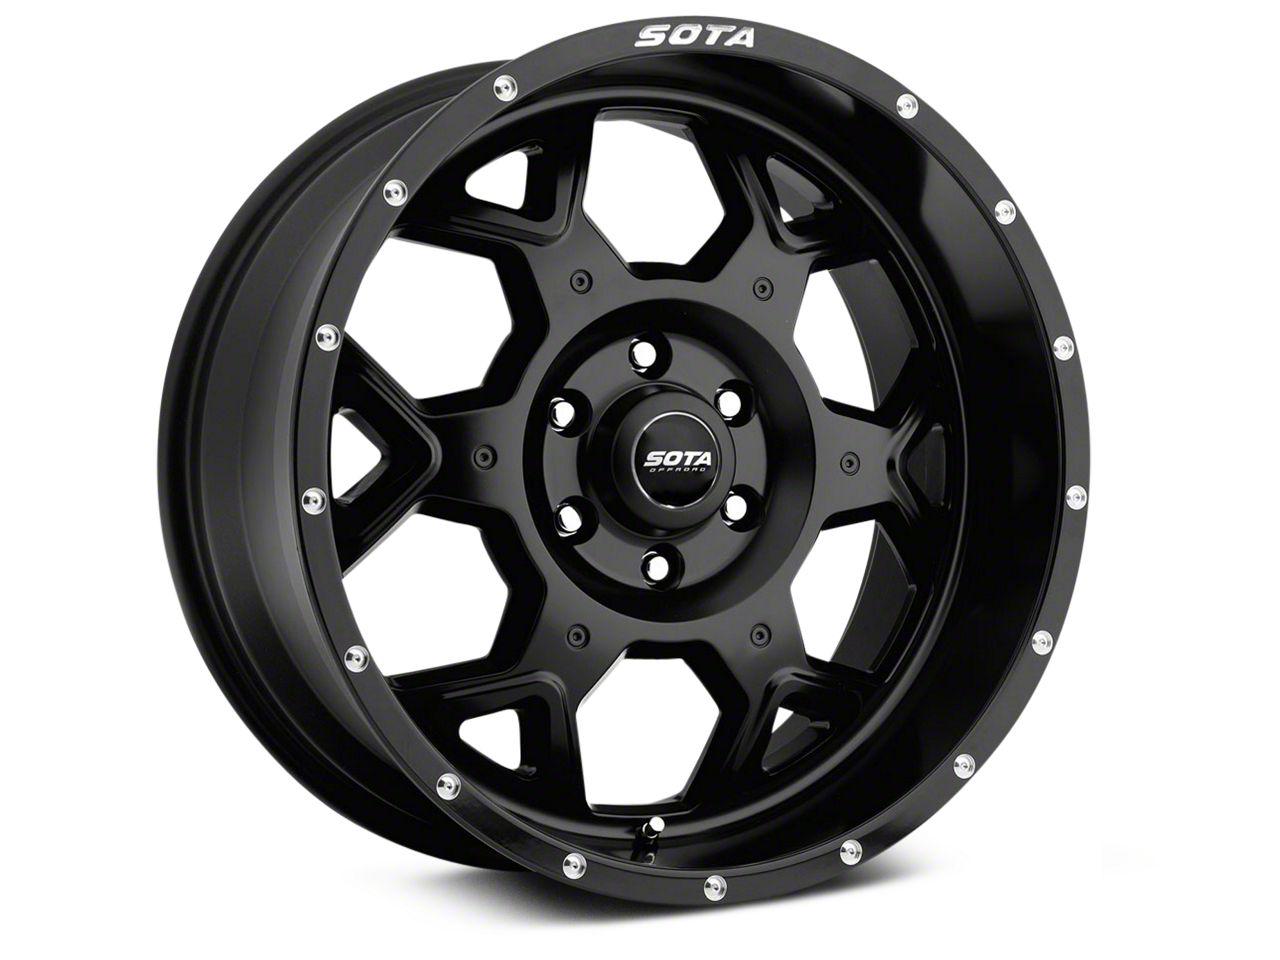 SOTA Off Road SKUL Stealth Black 6-Lug Wheel - 20x9 (99-18 Silverado 1500)